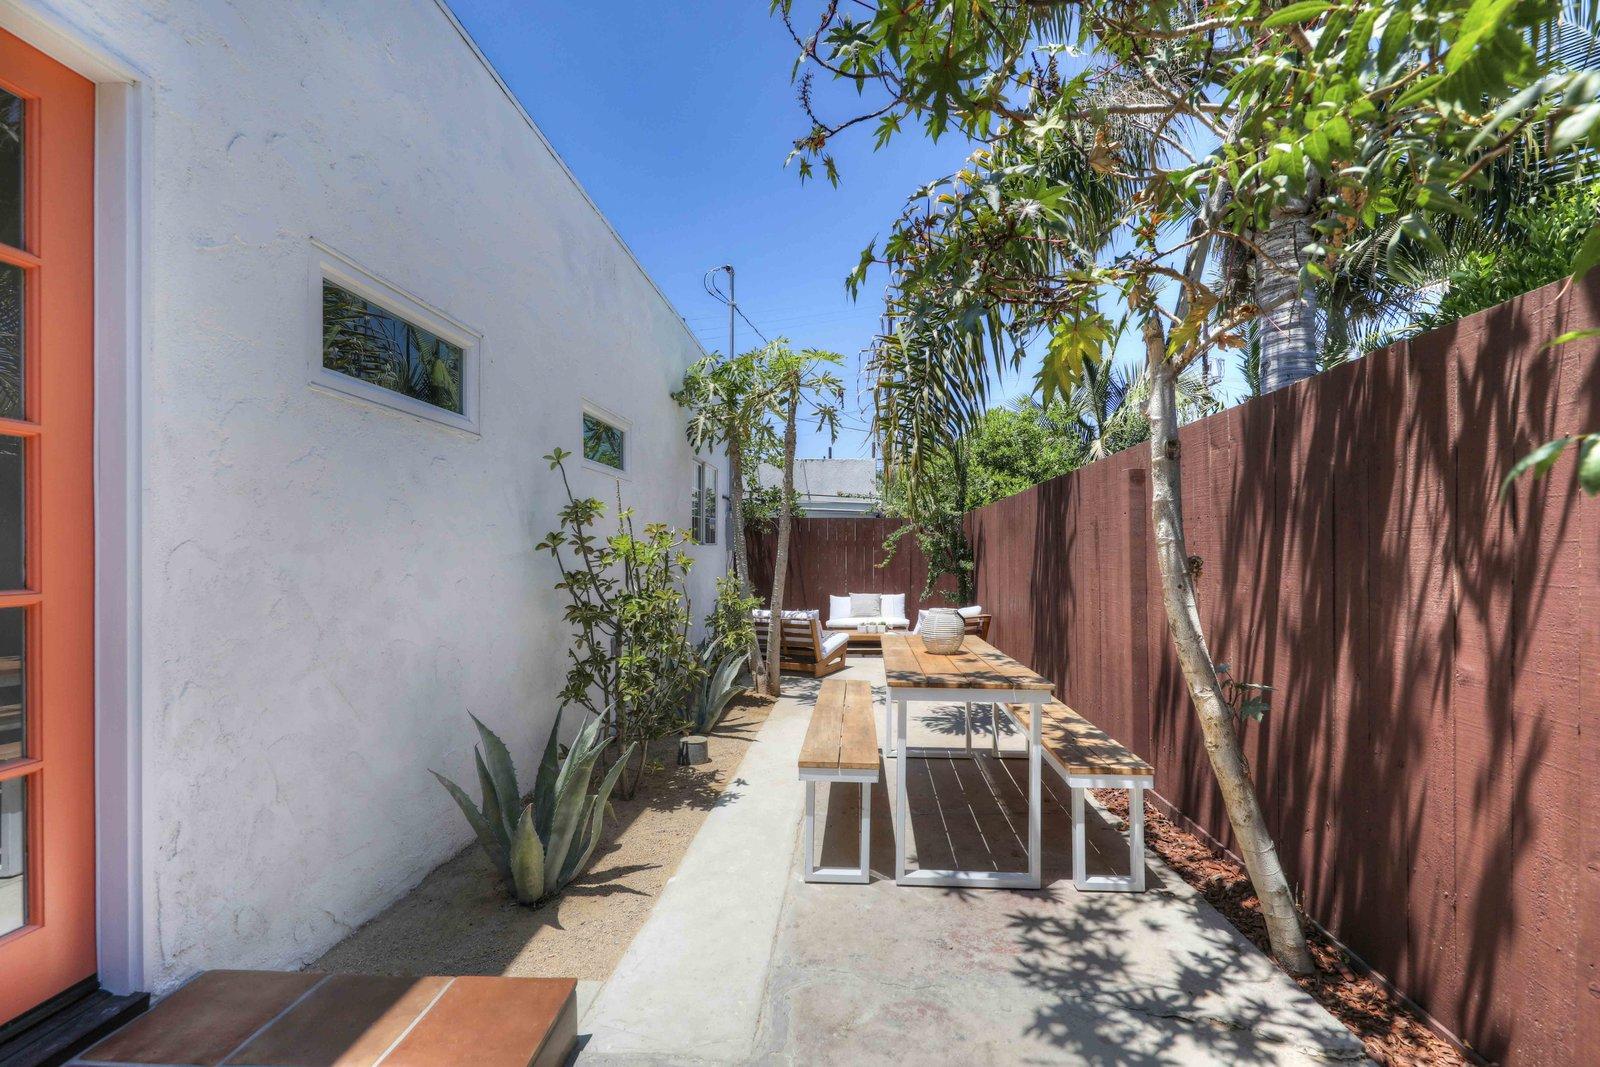 Los Angeles Spanish Bungalow backyard